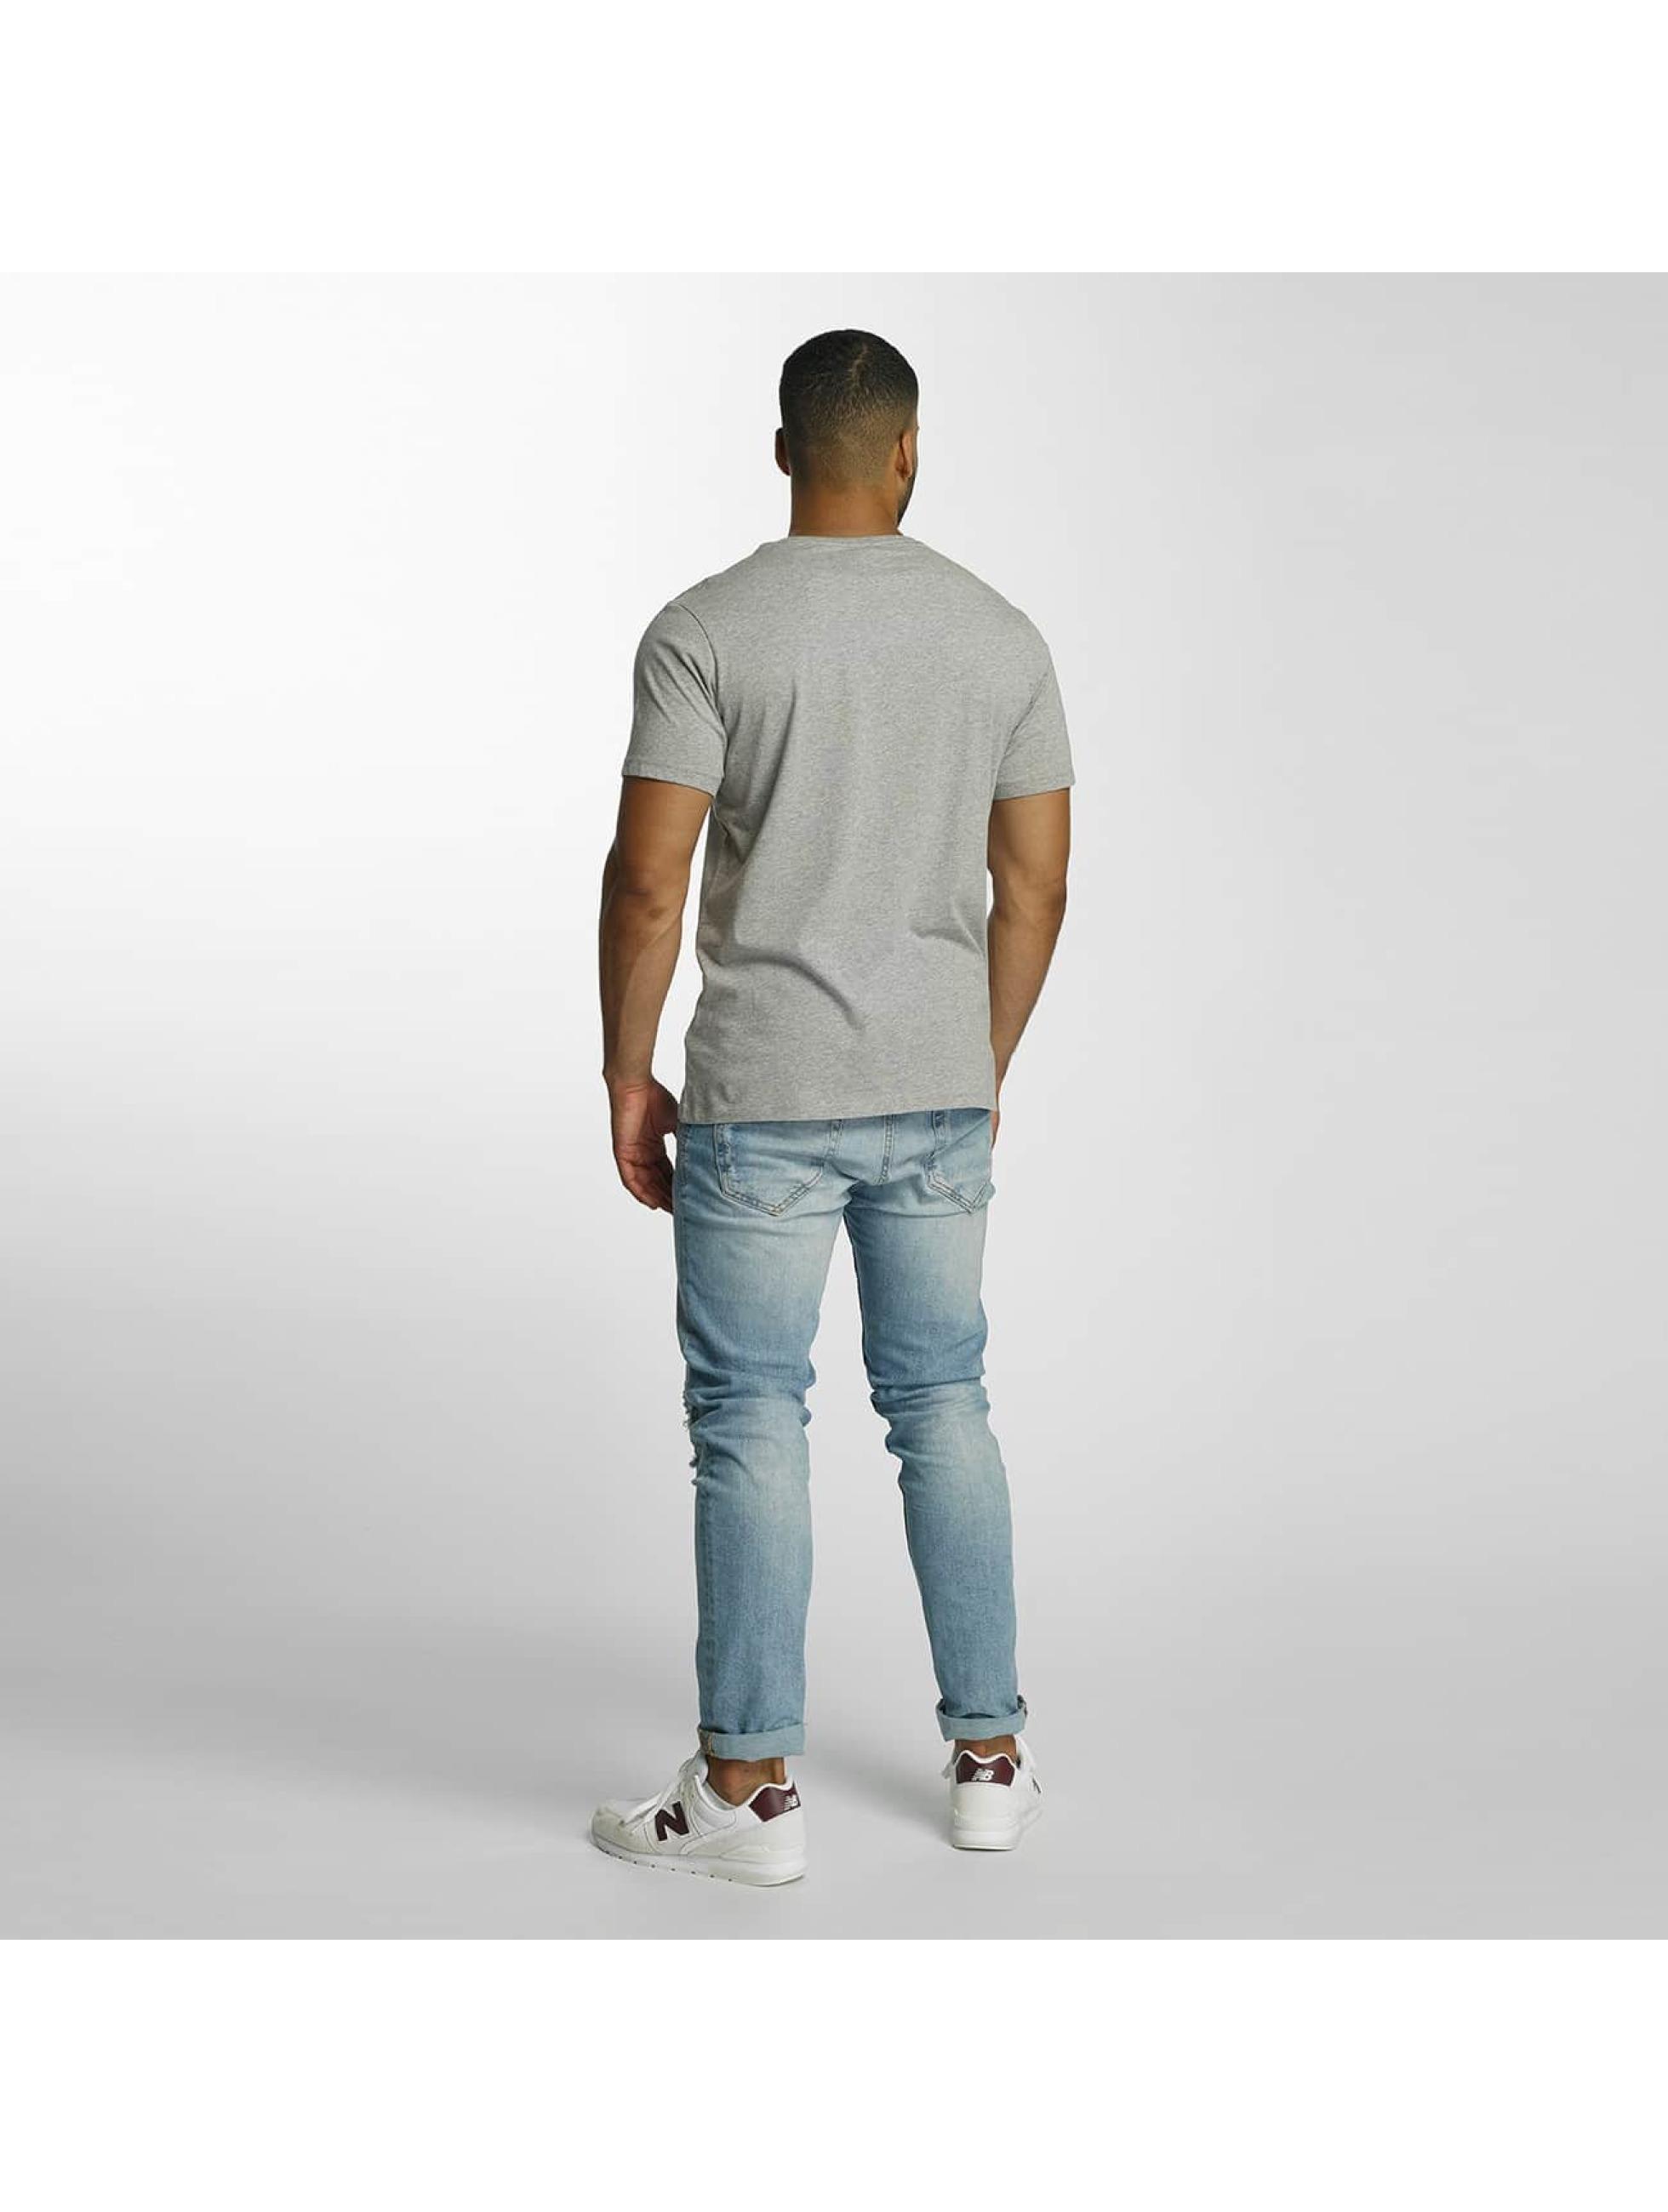 Timberland T-Shirt Dustan River Camo Print grau